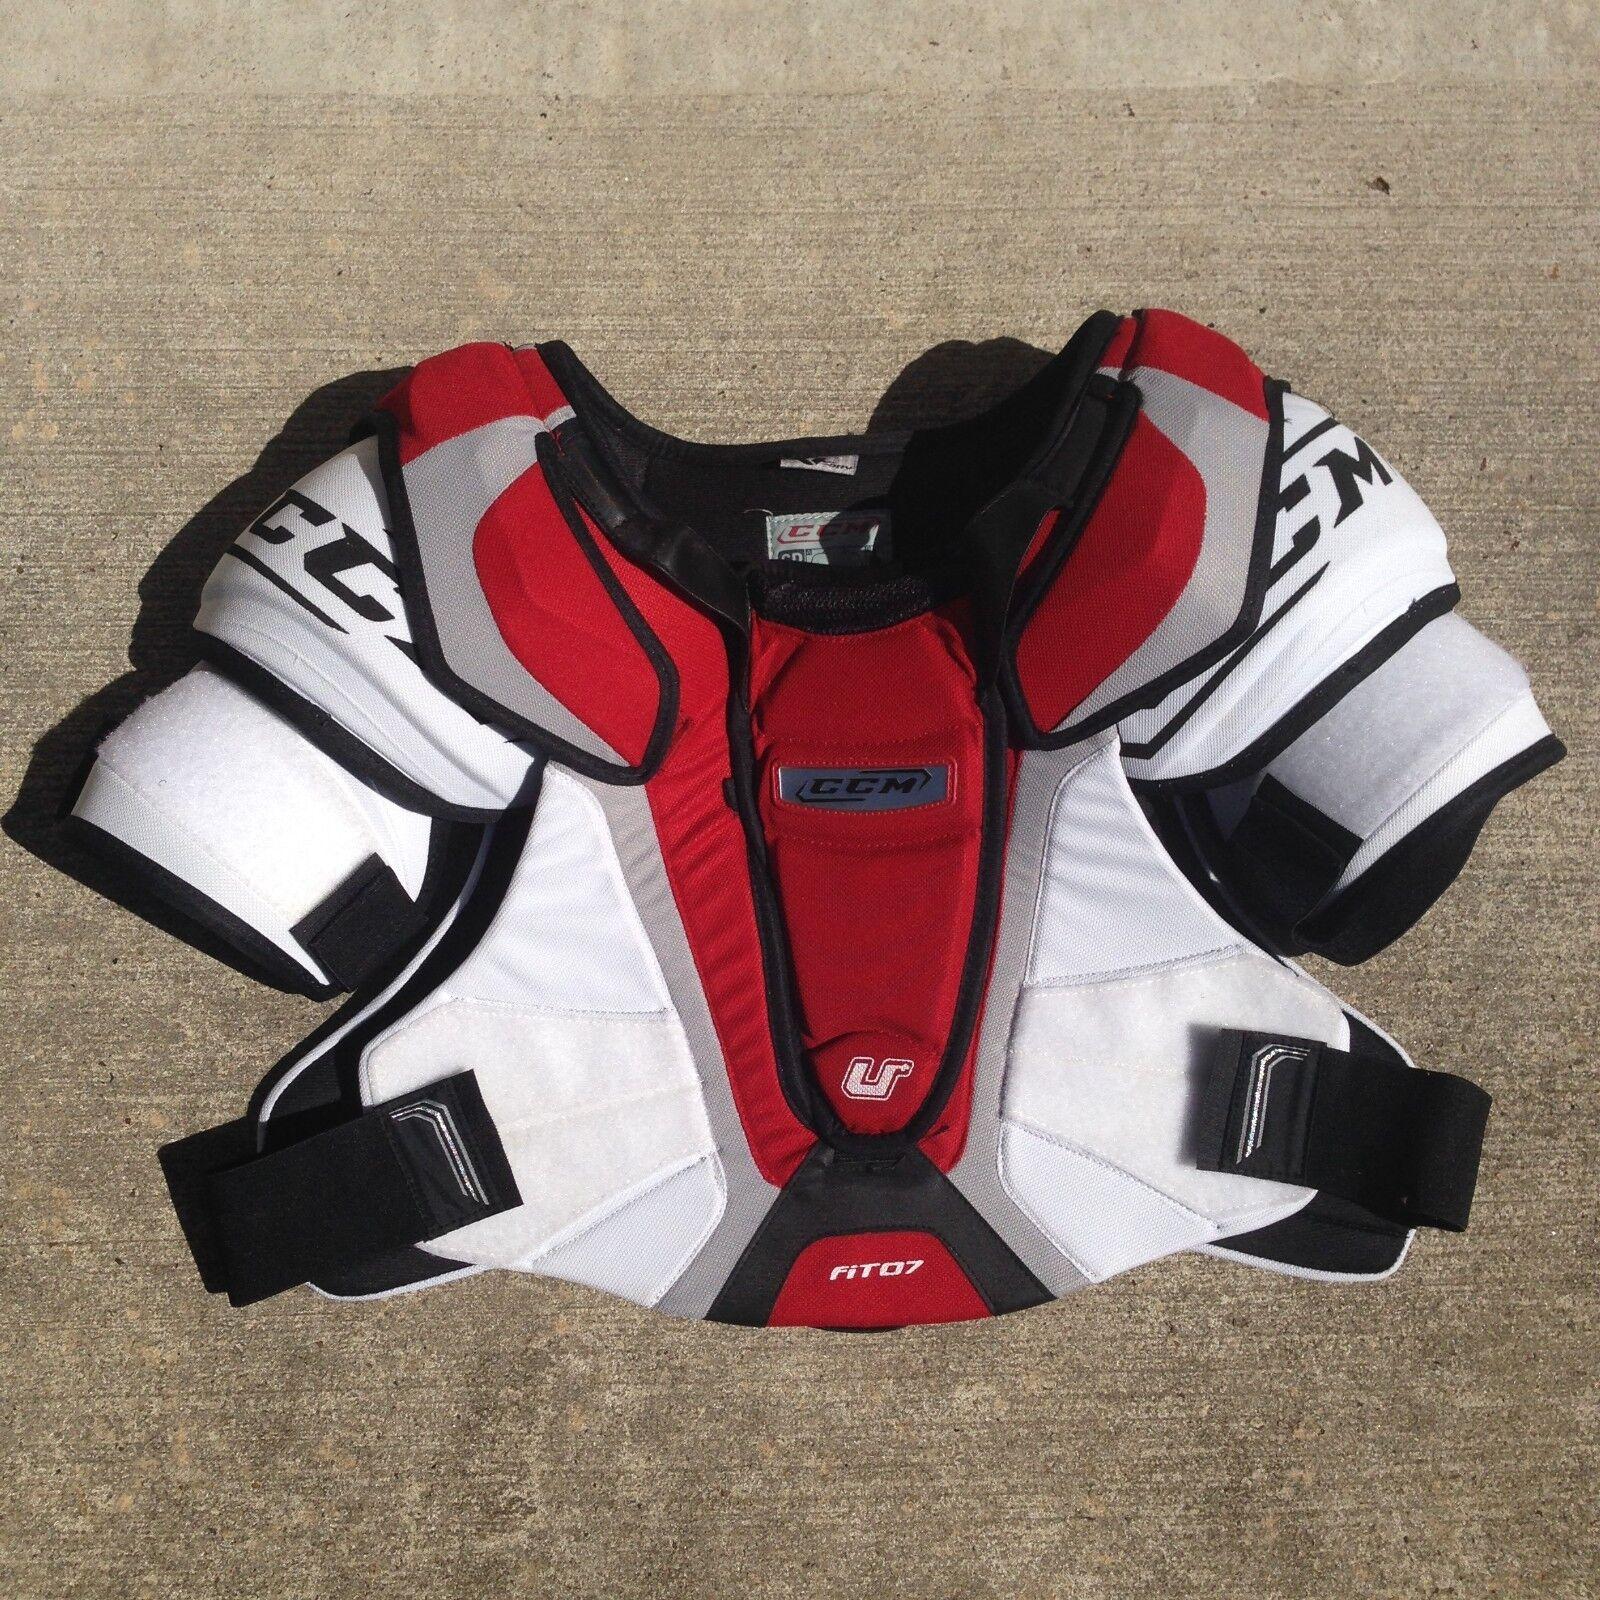 CCM U+ Fit 07 All Sizes Junior and Senior Shoulder Pads